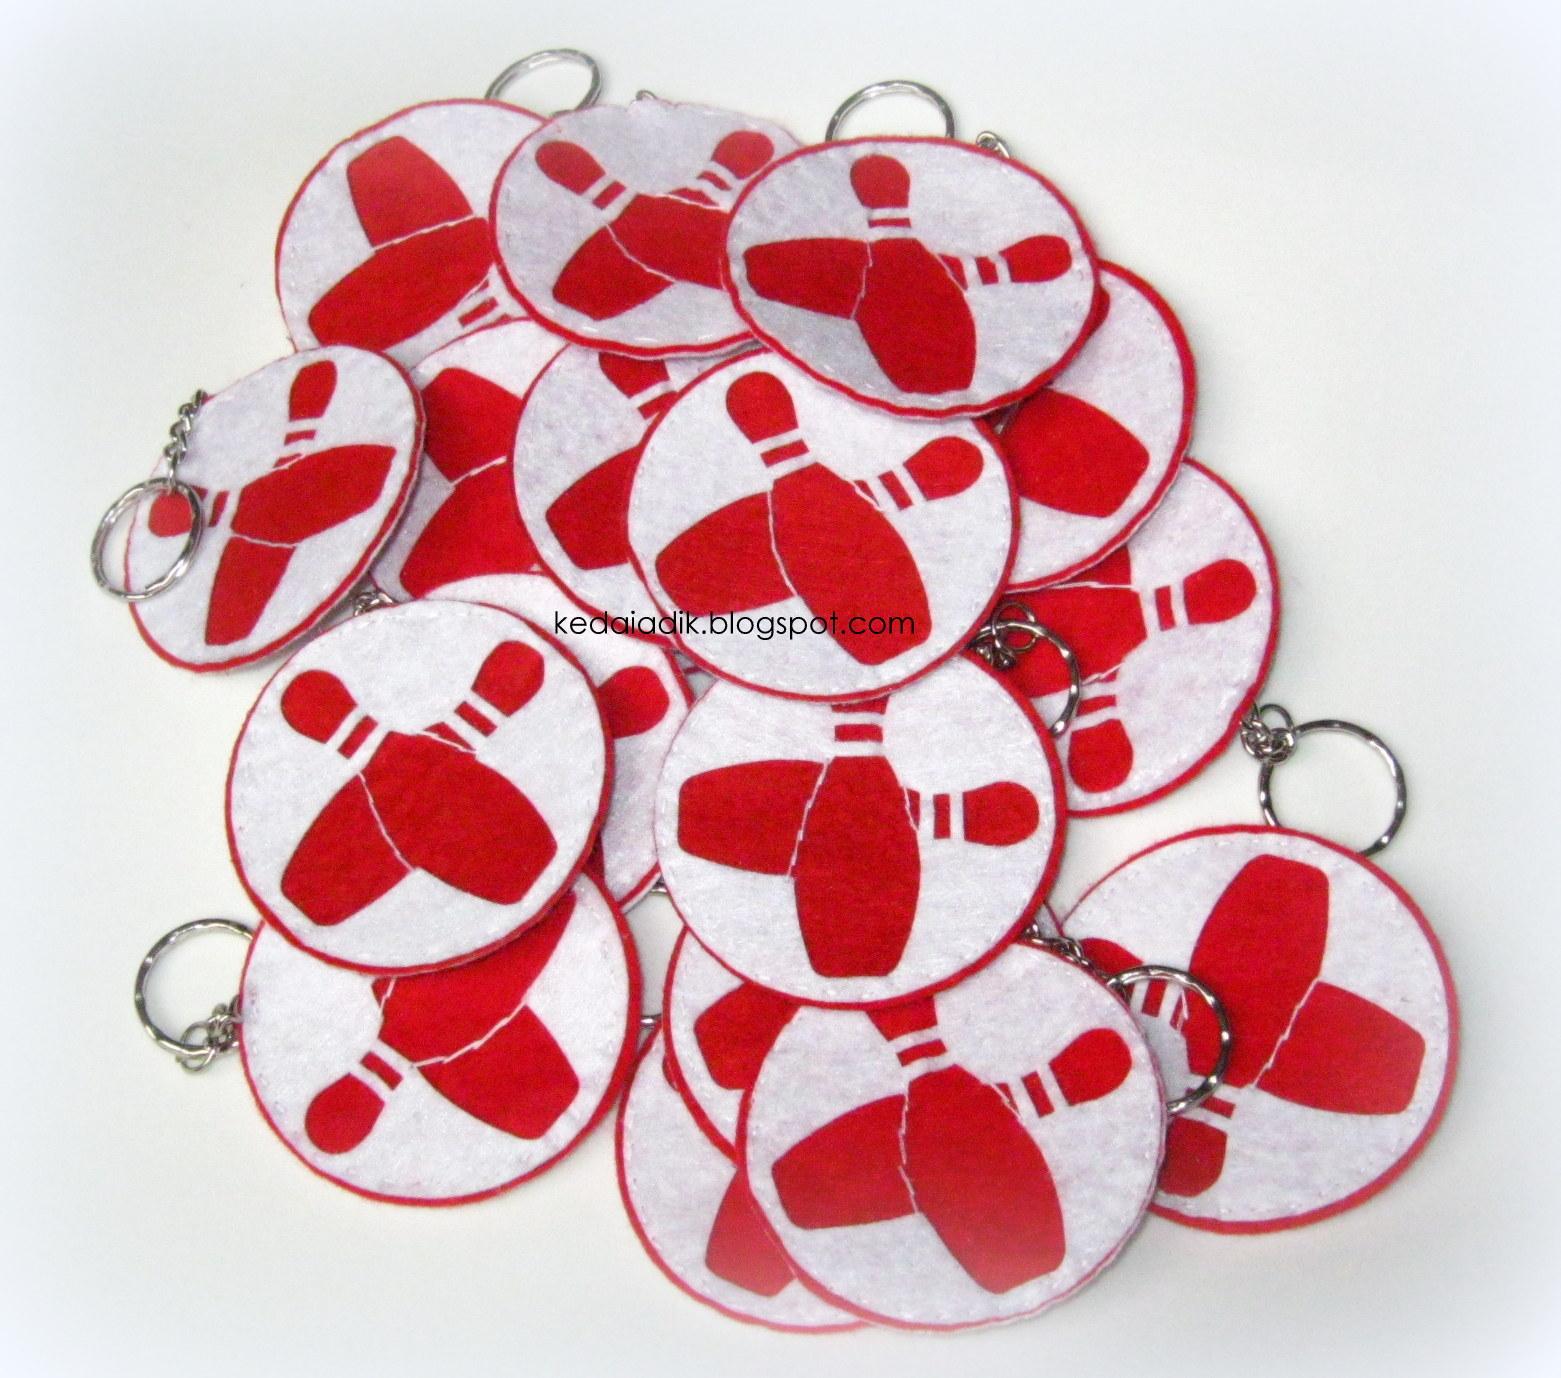 Get free sms pins